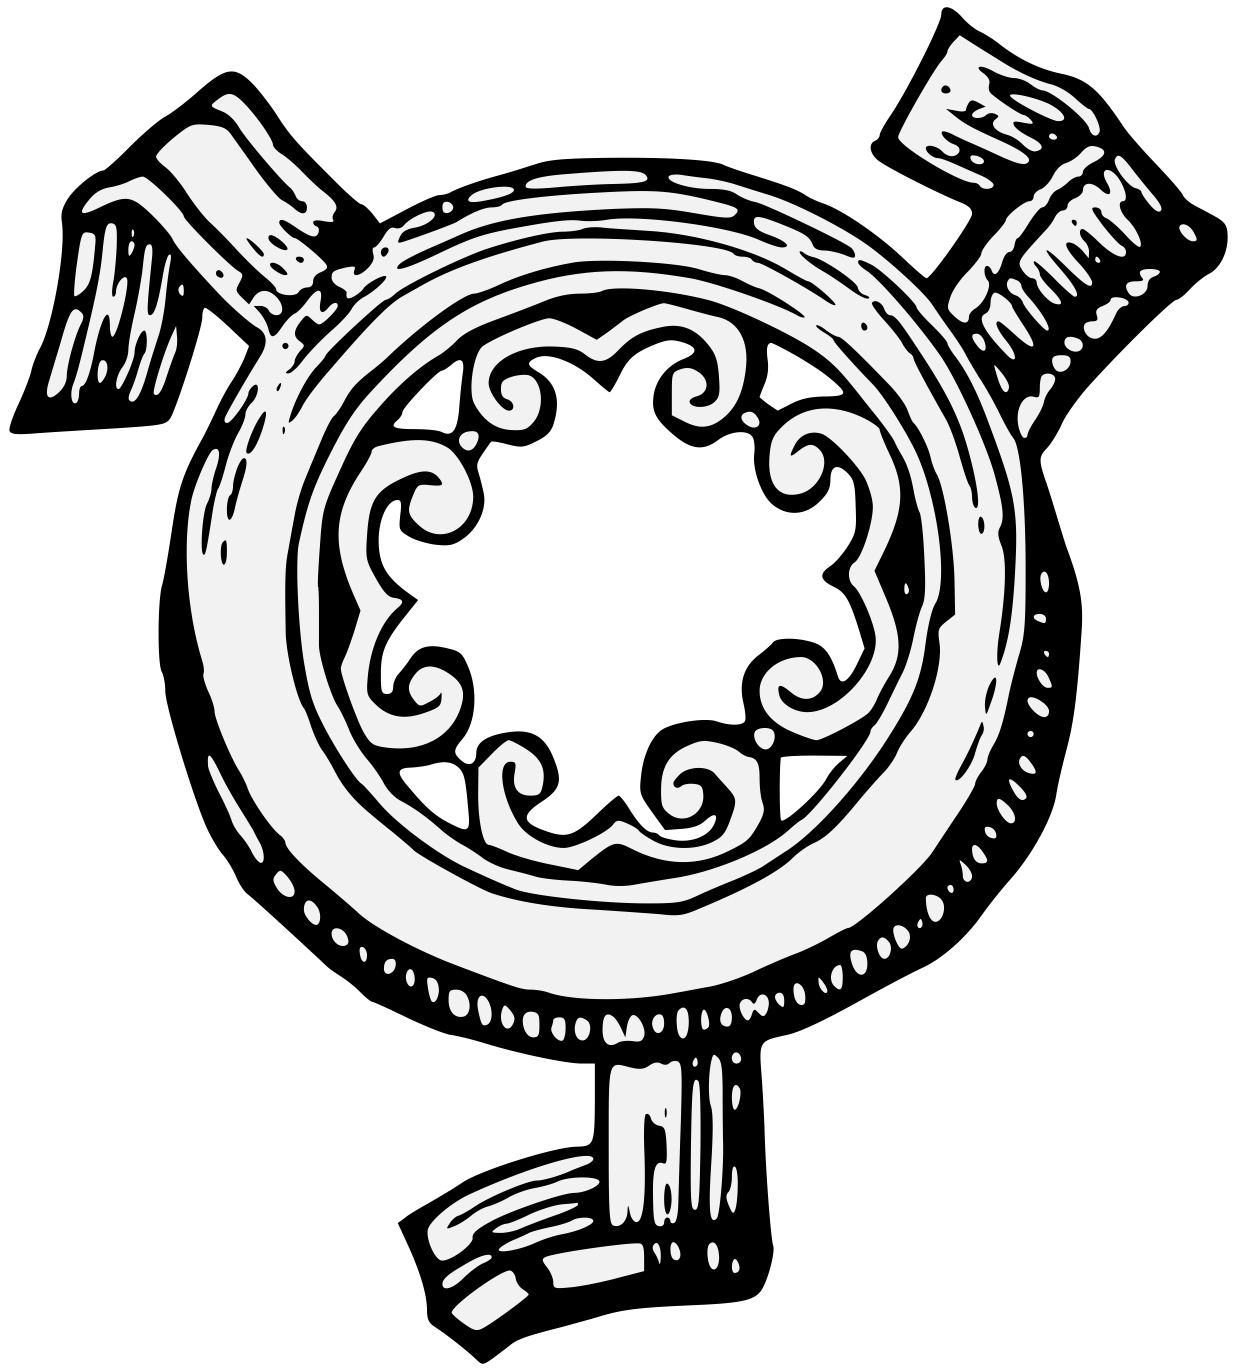 Dictionary clipart book index. Trivet traceable heraldic art